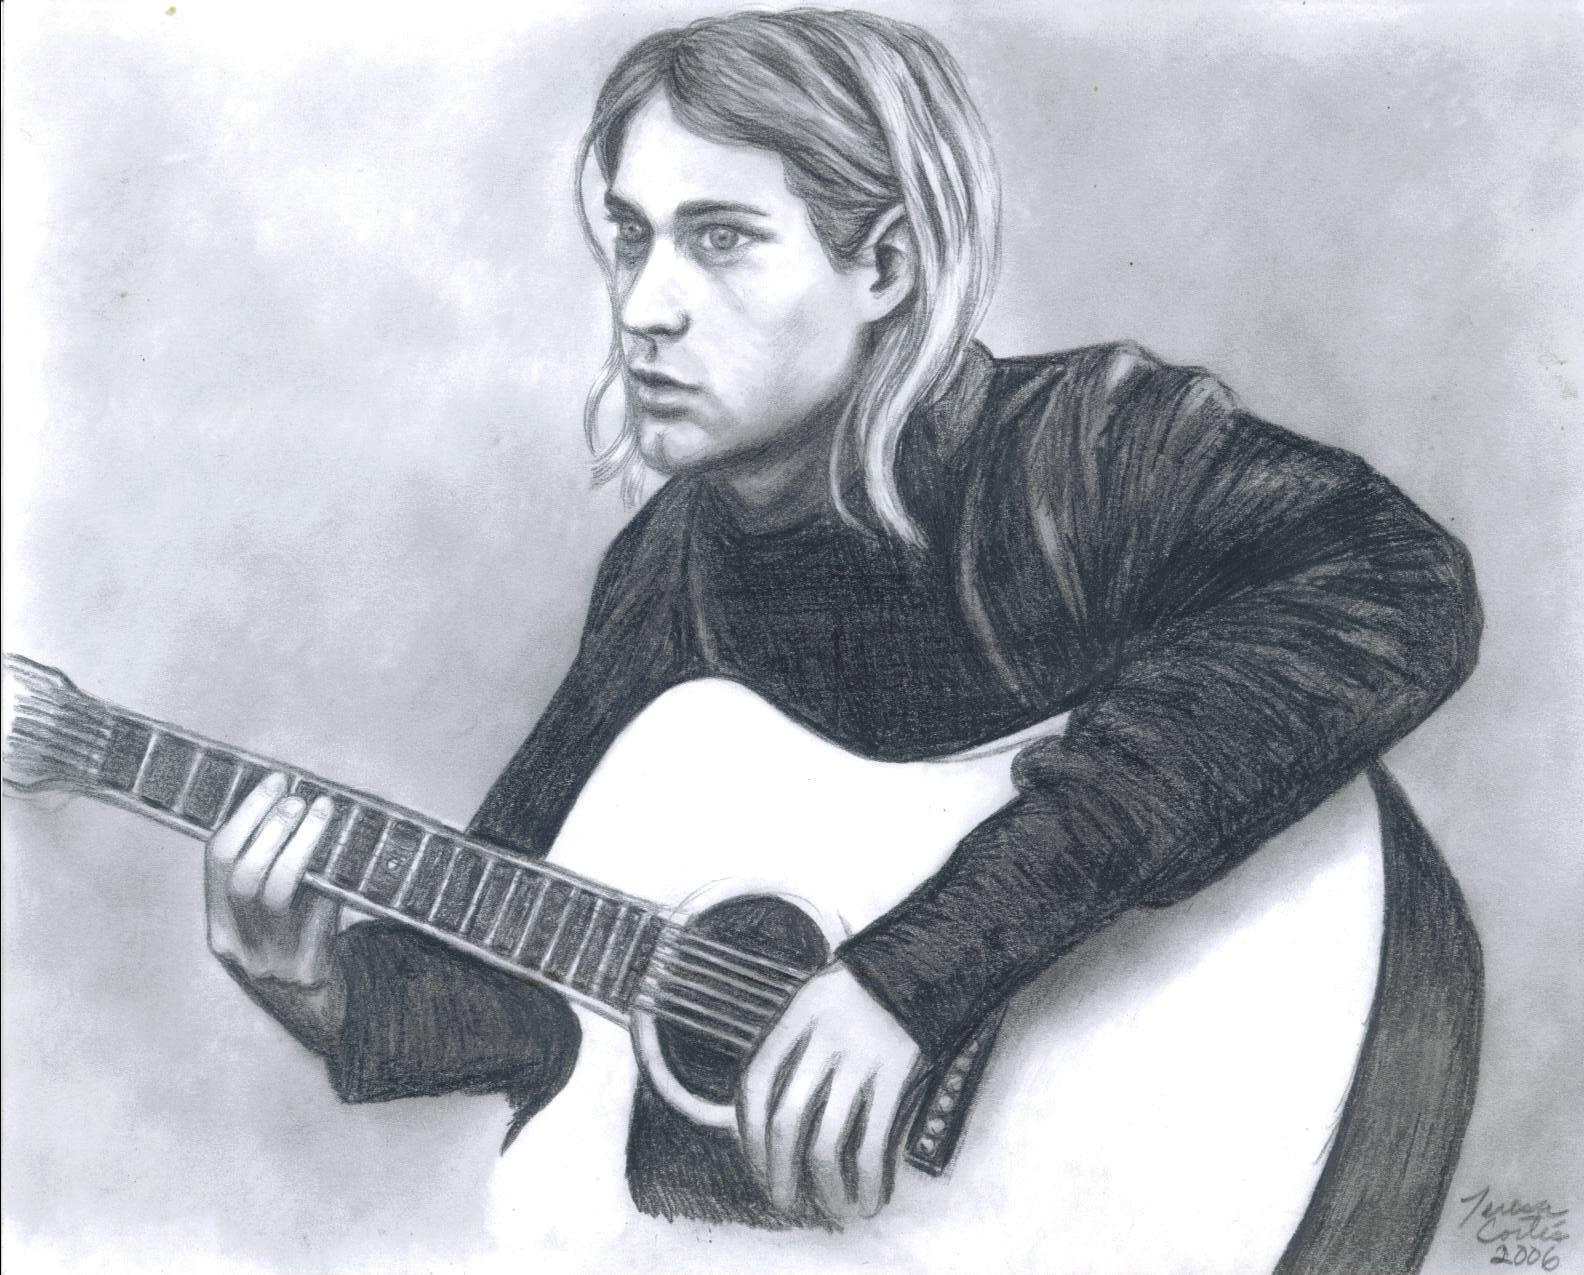 Kurt Cobain - Wallpaper